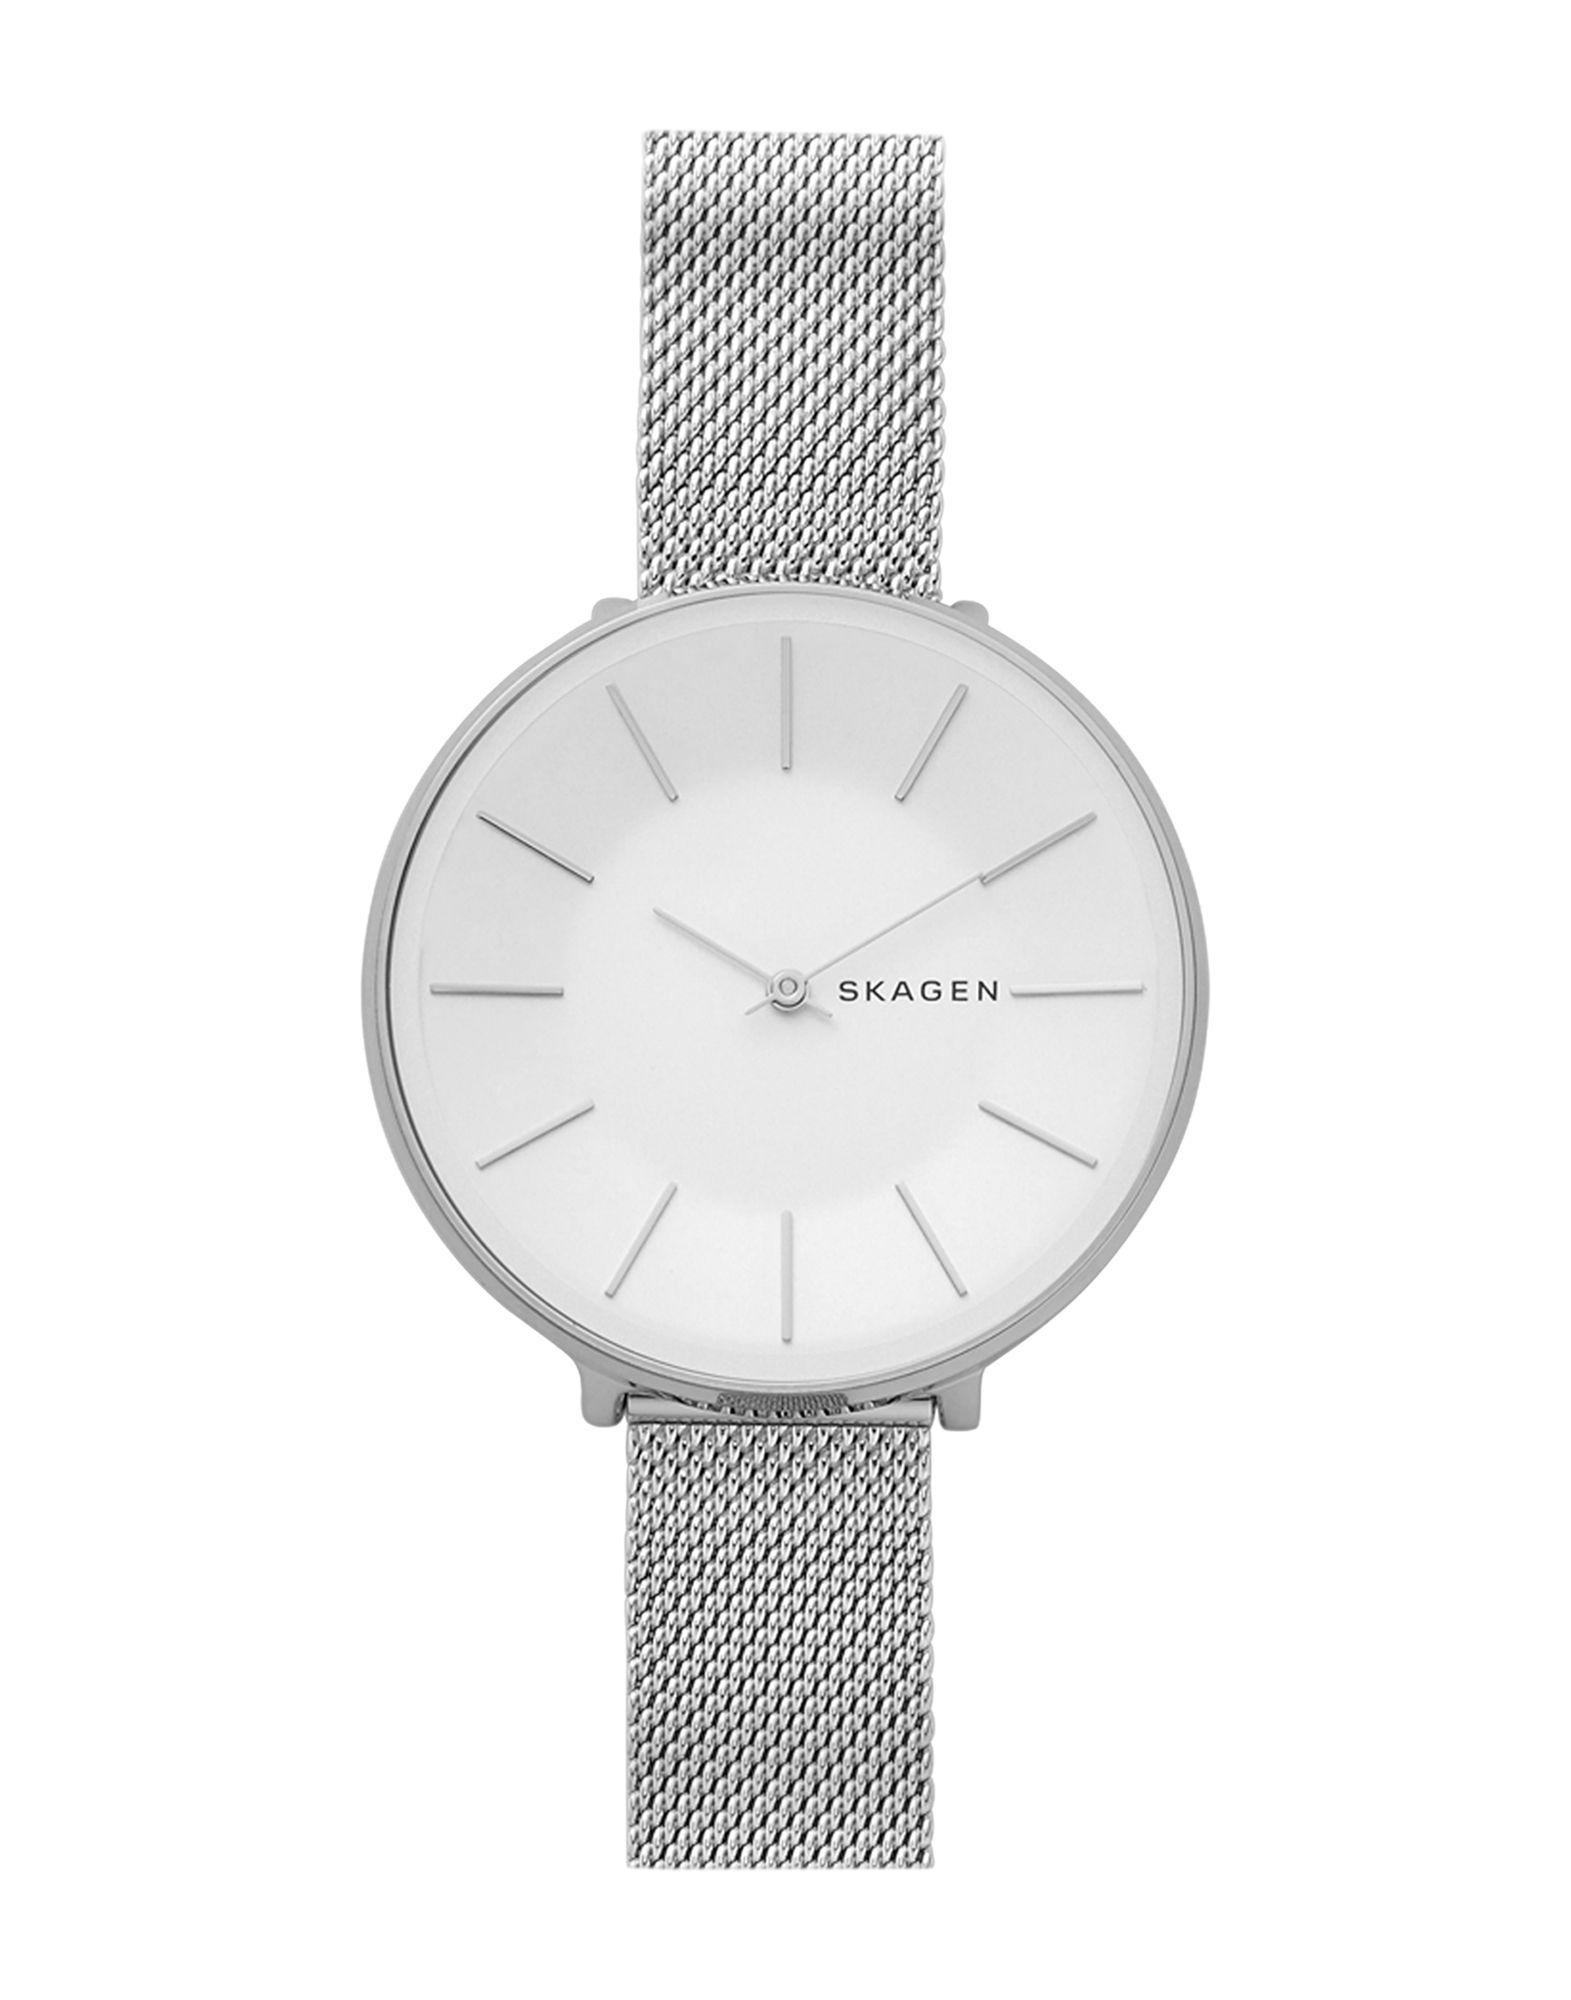 09cb58d83e93 Skagen Denmark. Reloj de pulsera de mujer de color blanco